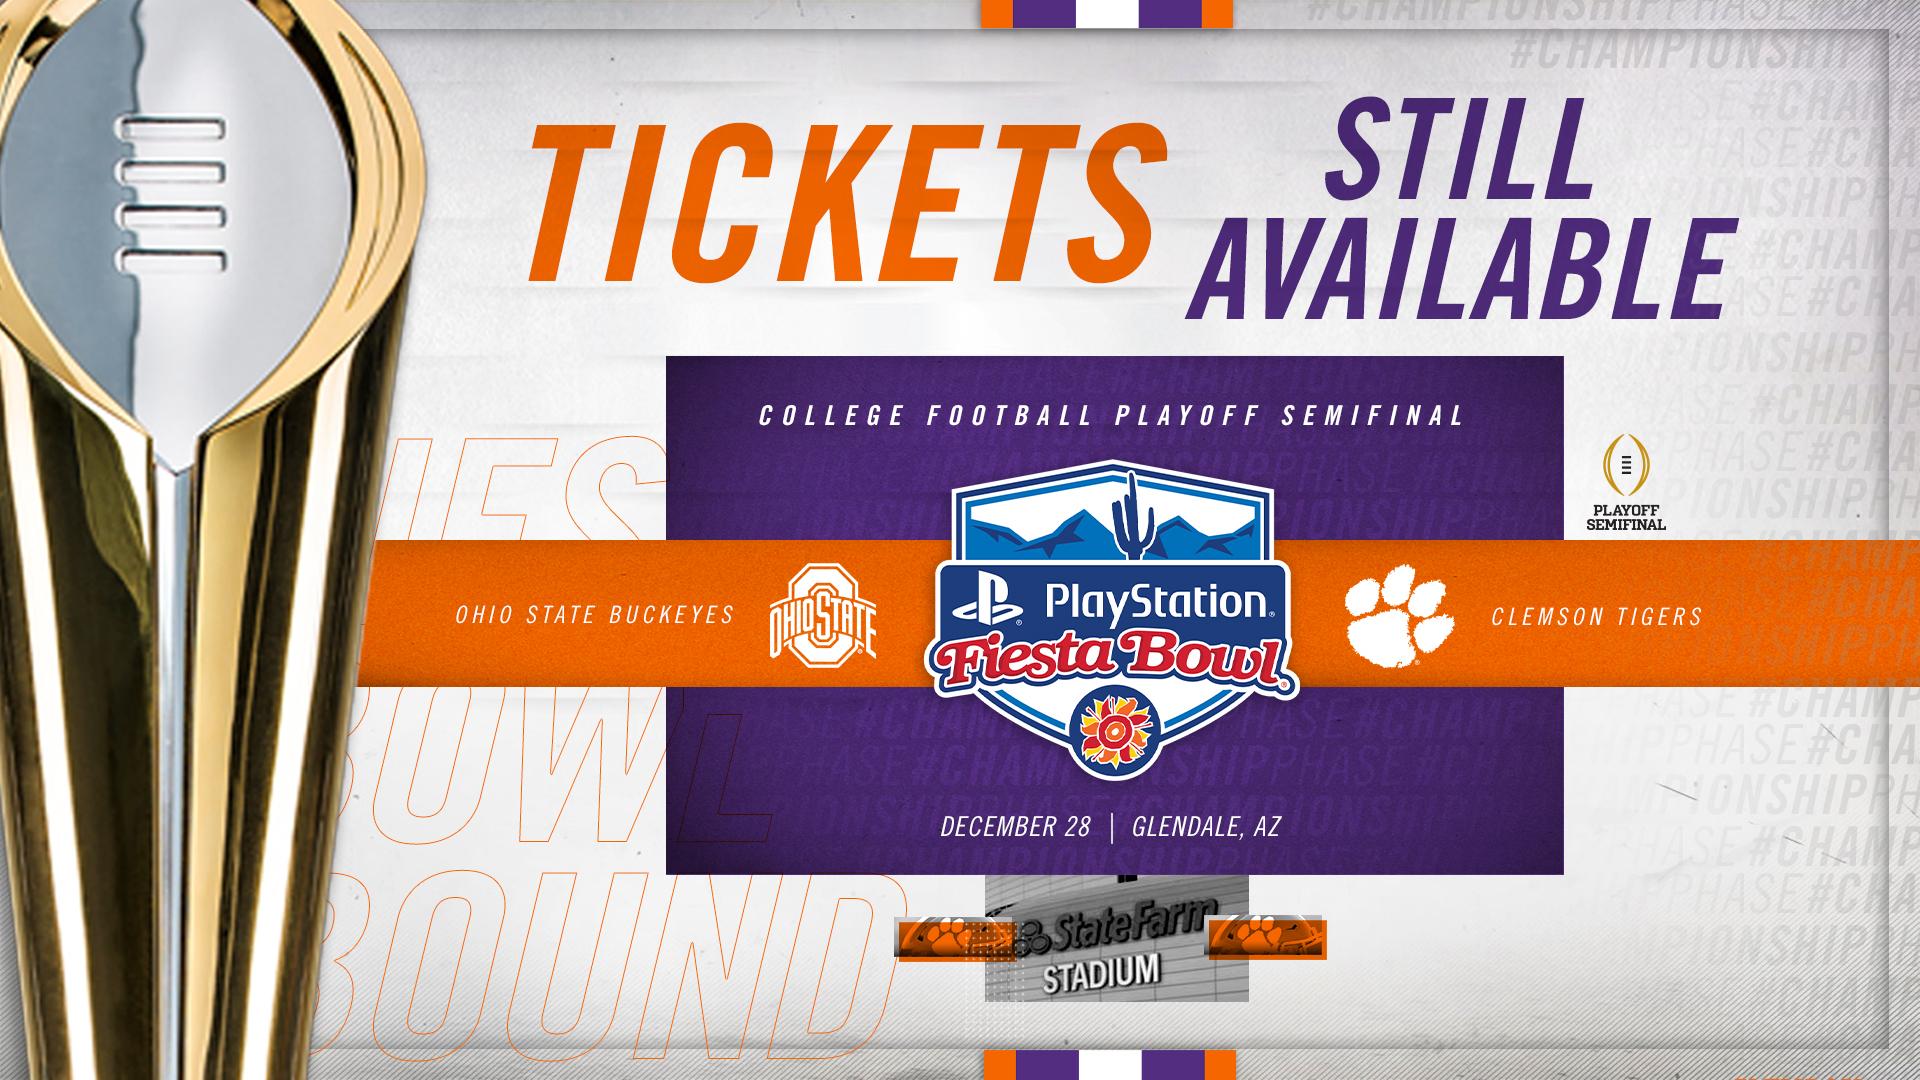 Tickets Still Available for Fiesta Bowl